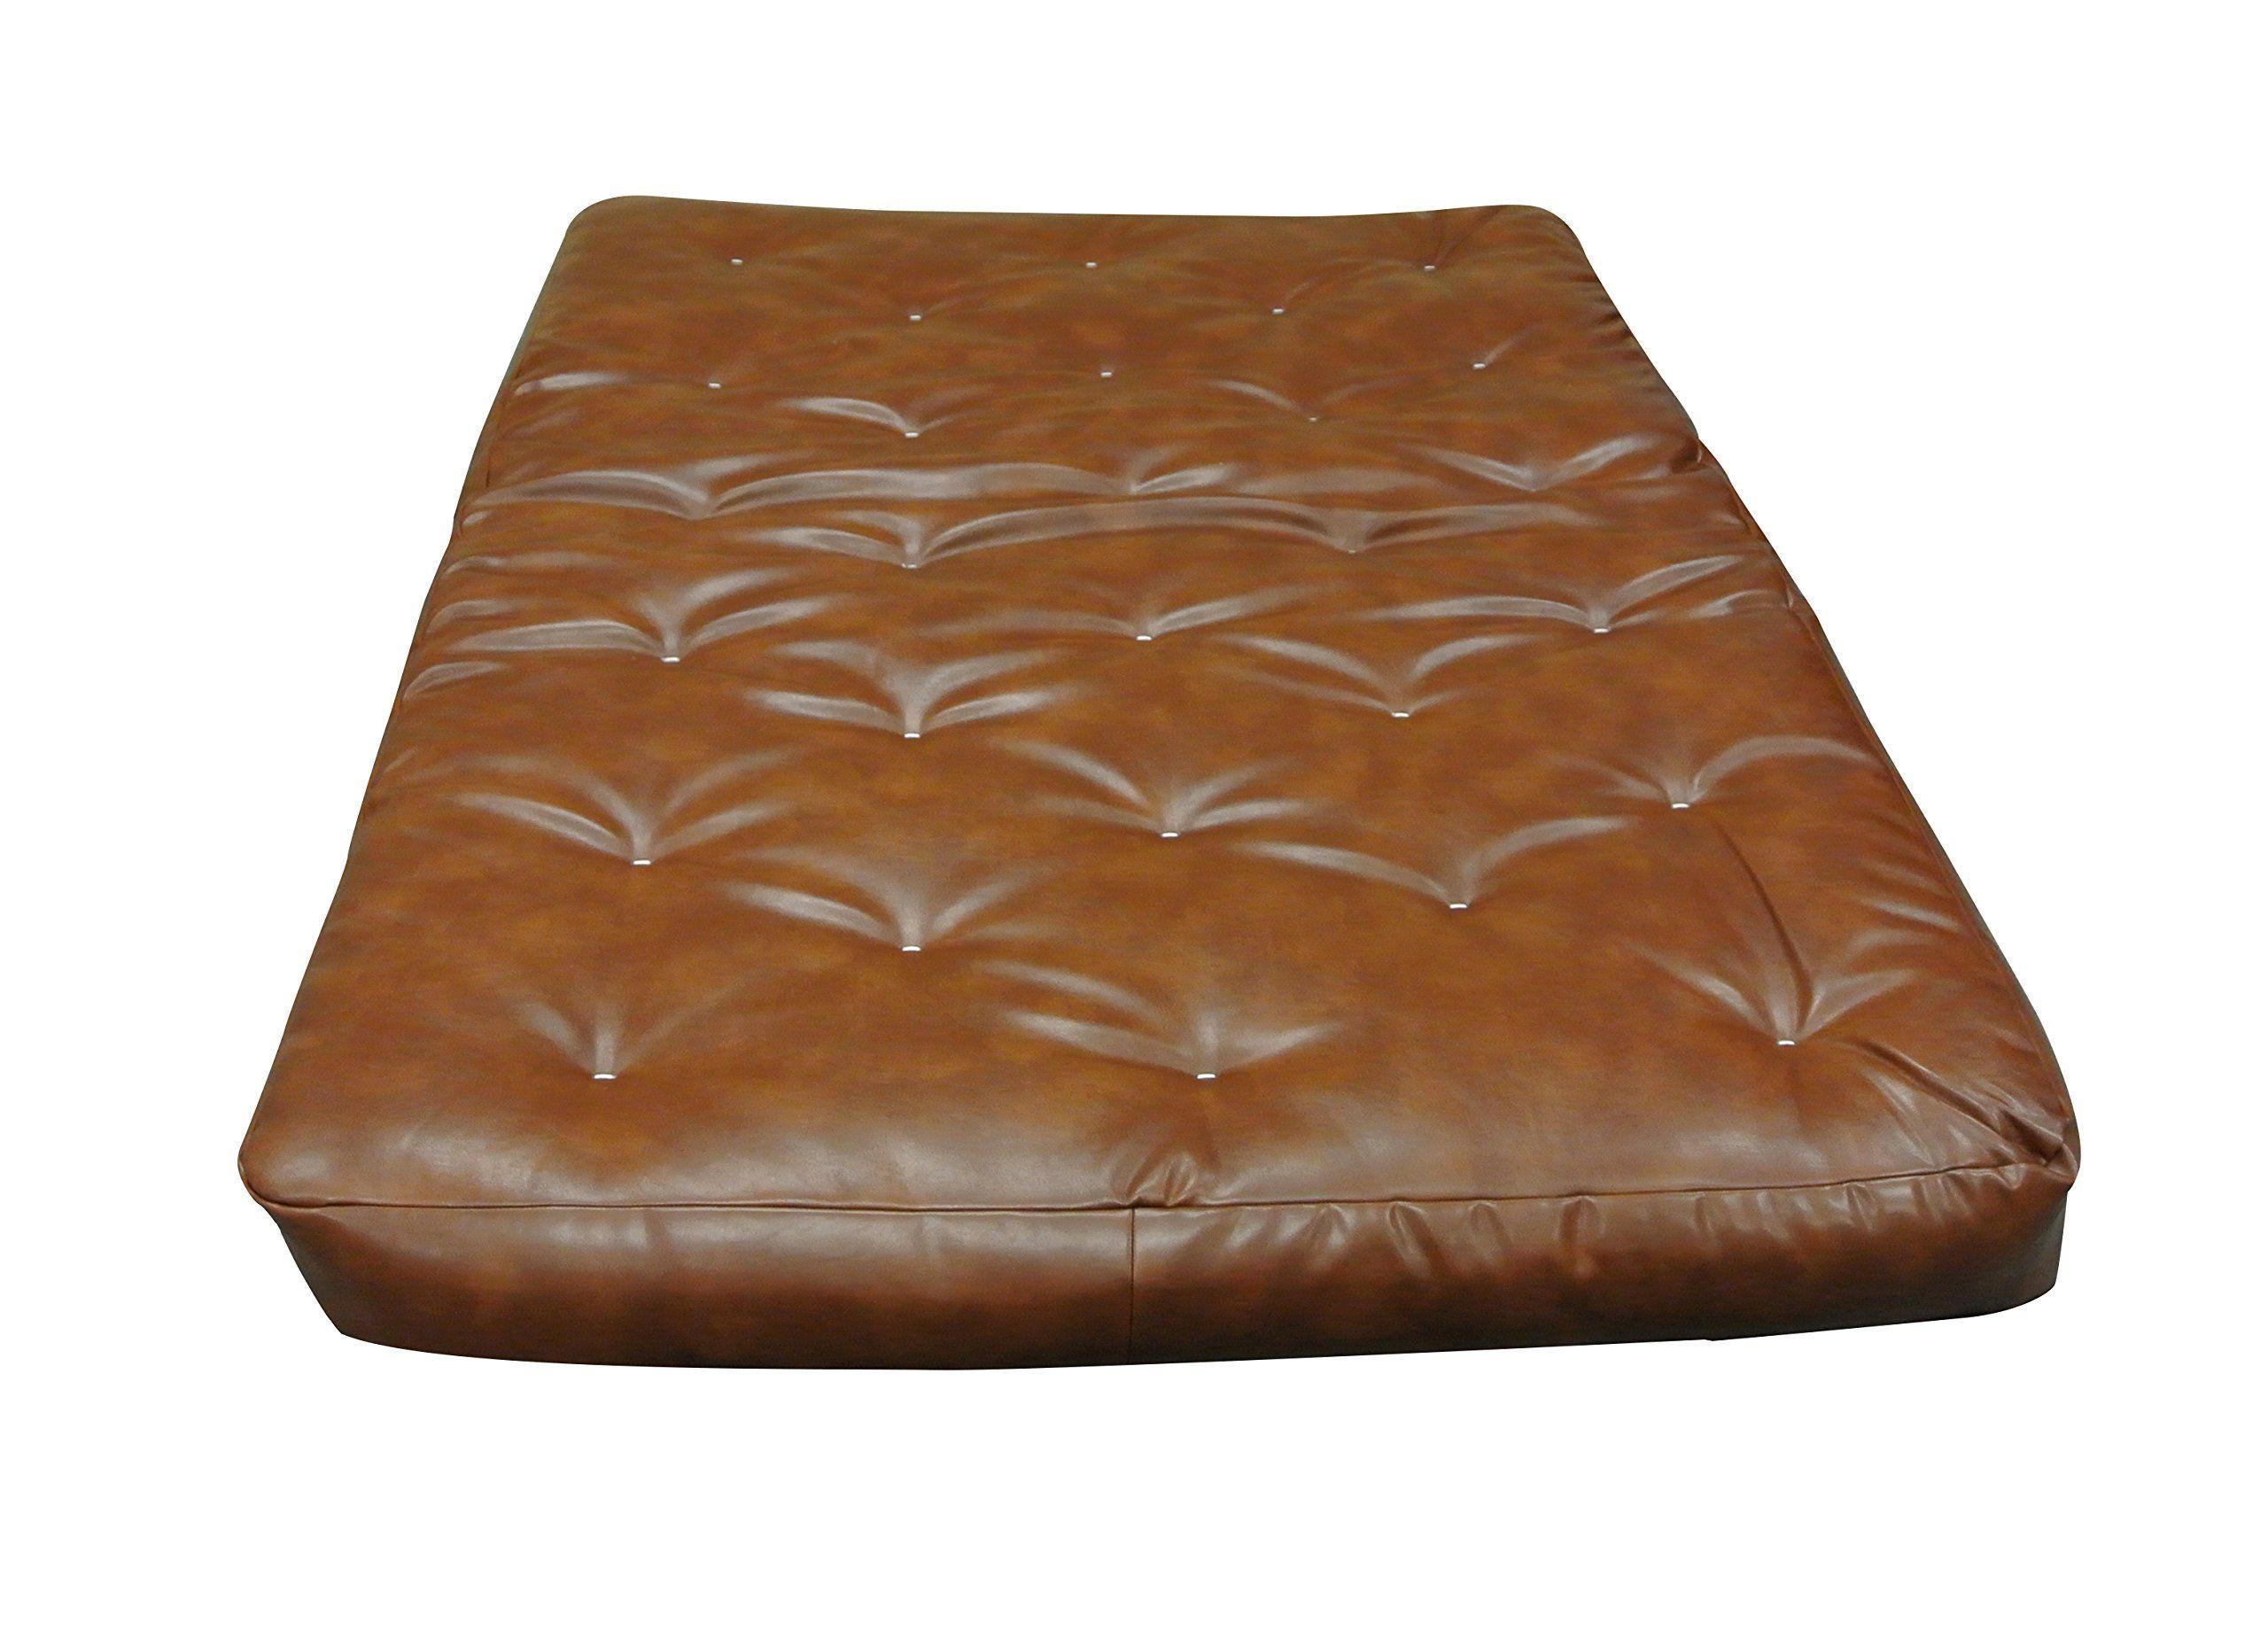 gold bond 0628p00130 9 viscocoil ii futon mattress saddle leather